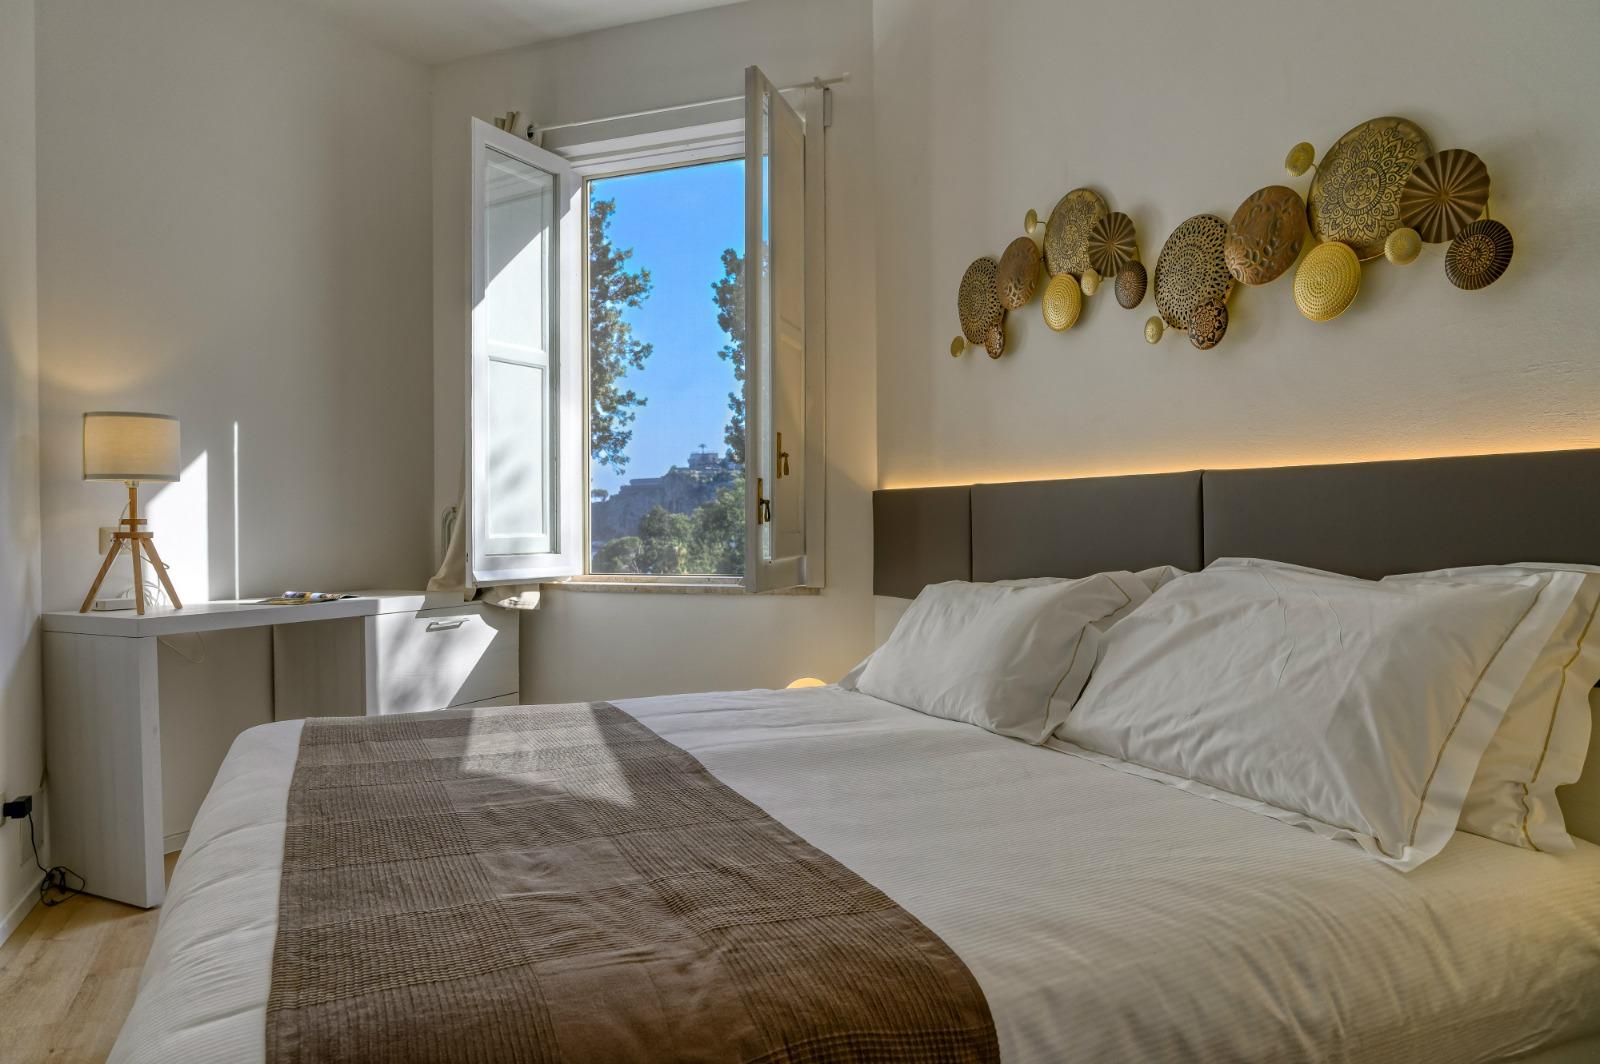 Interior design Business & Contract, Taormina, Isolabella